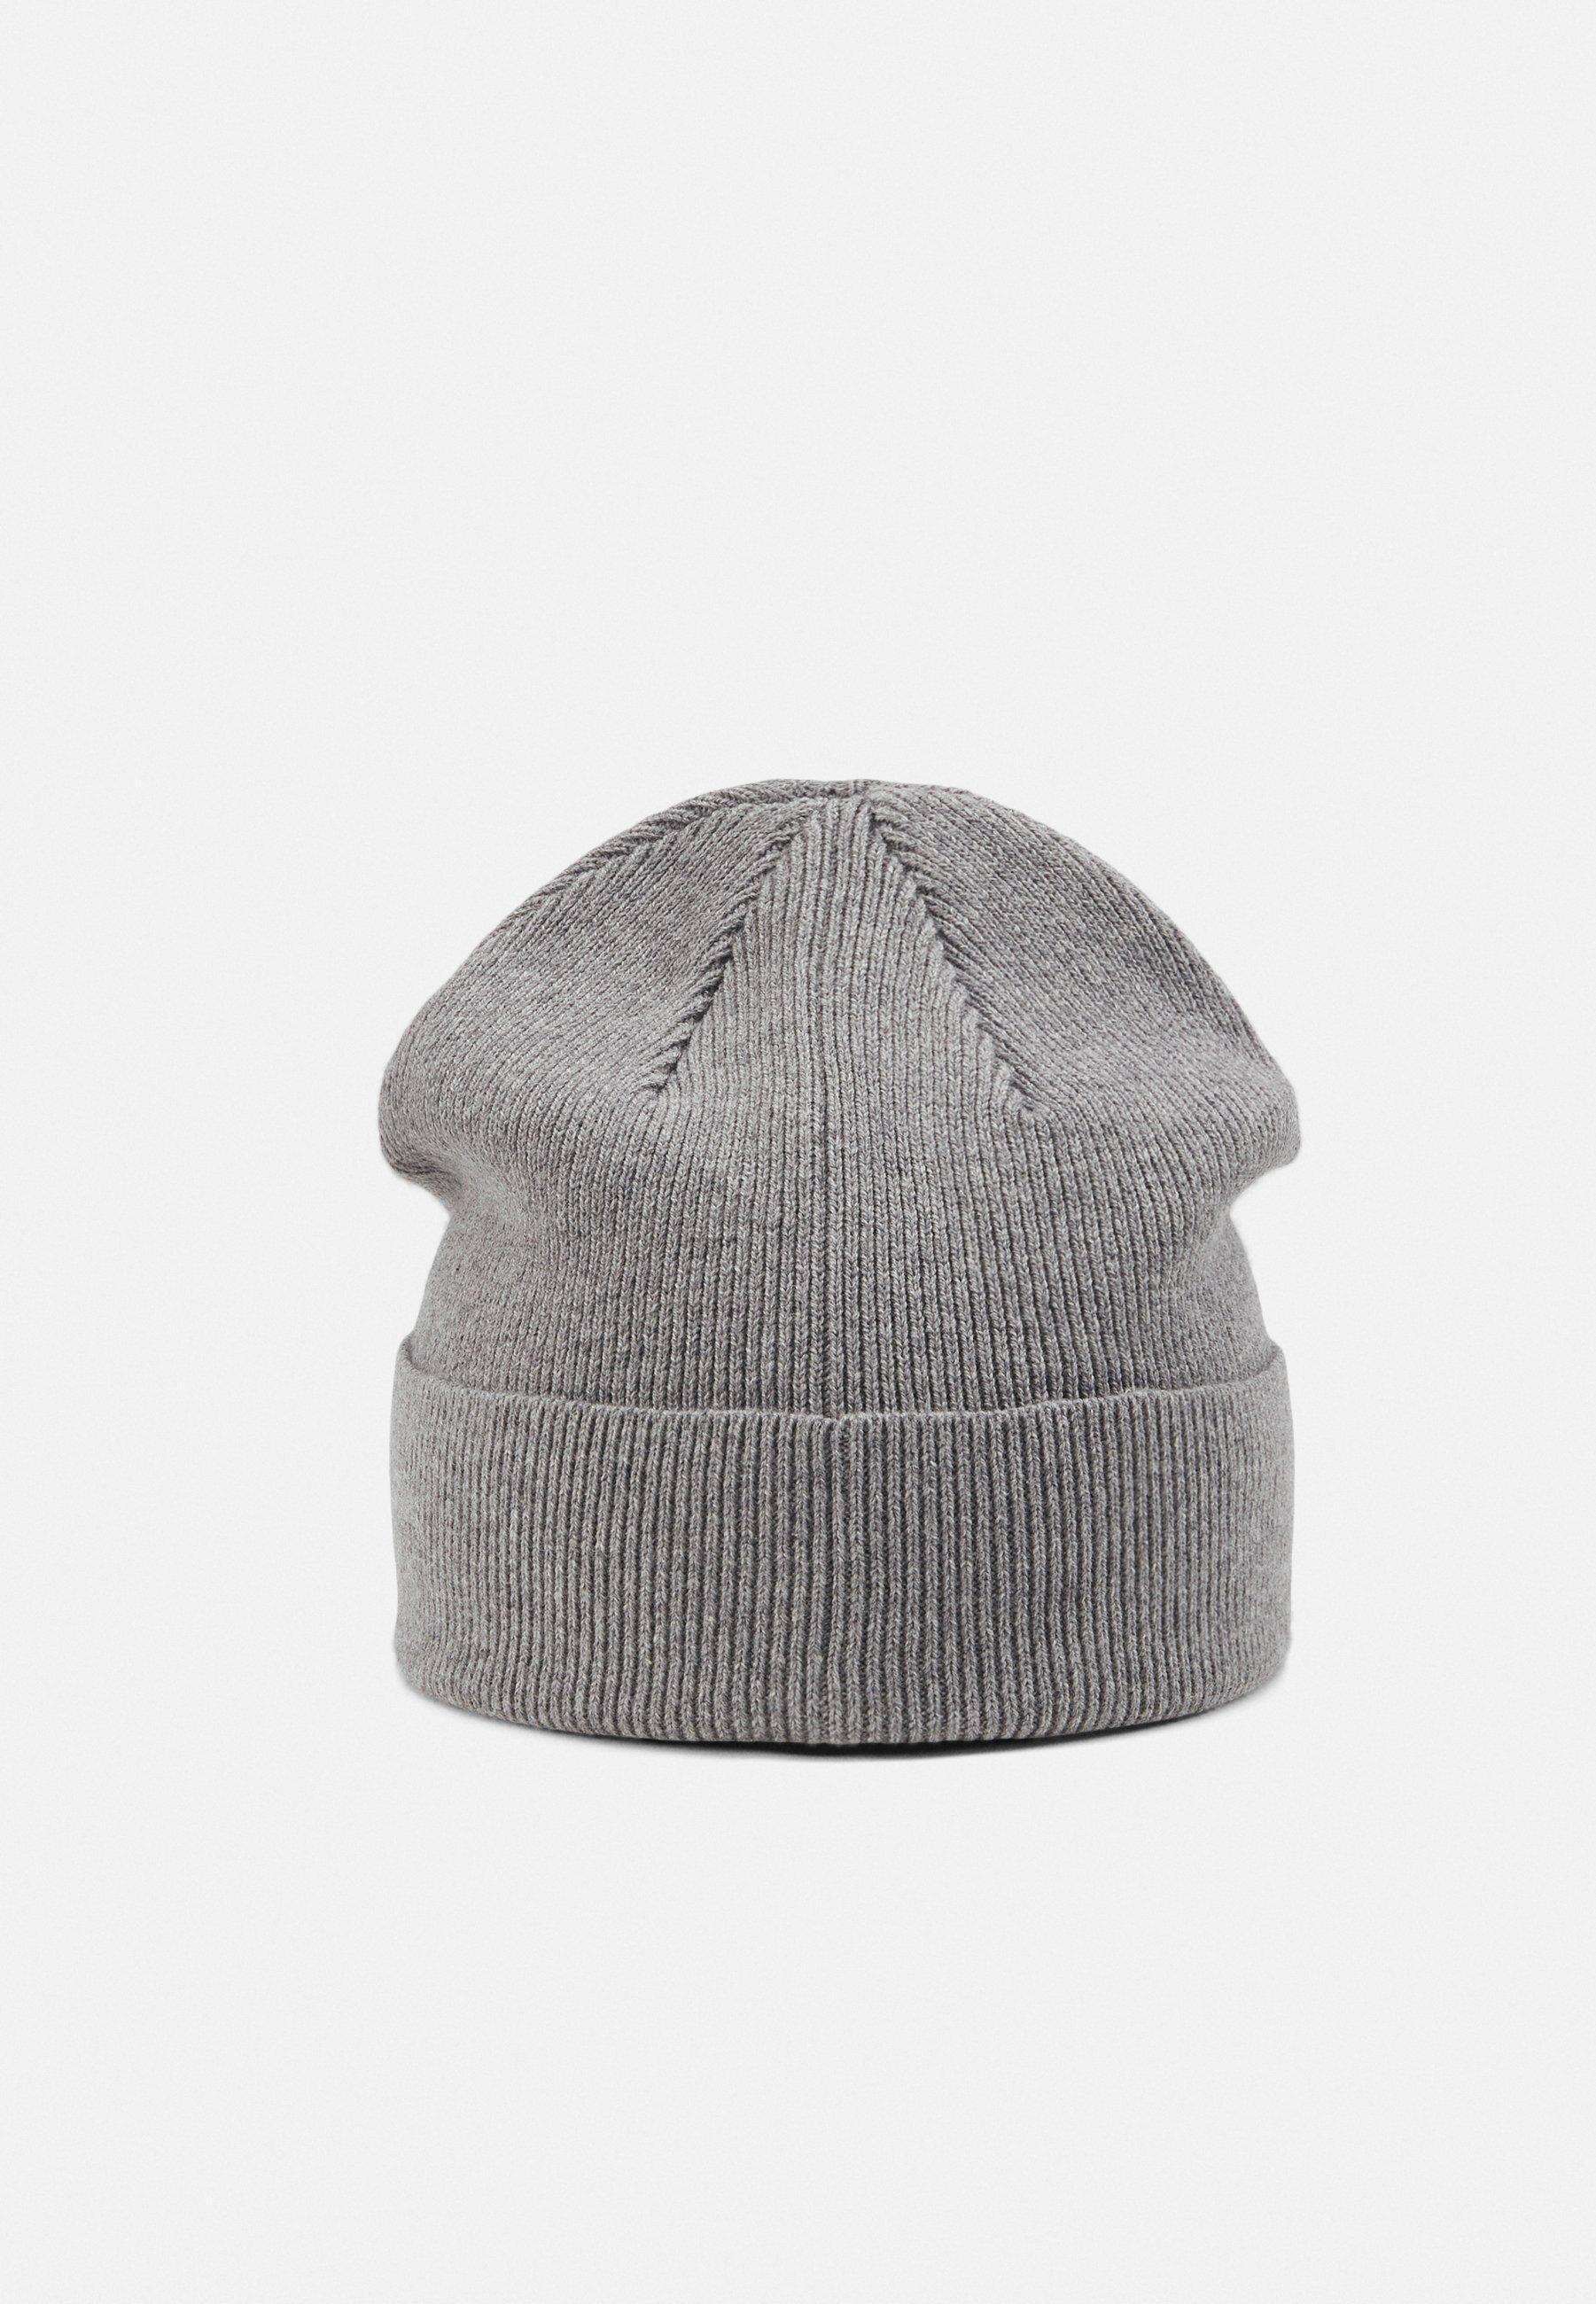 DRYKORN STOLLET - Mütze - grey/grau - Herrenaccessoires 4flV2